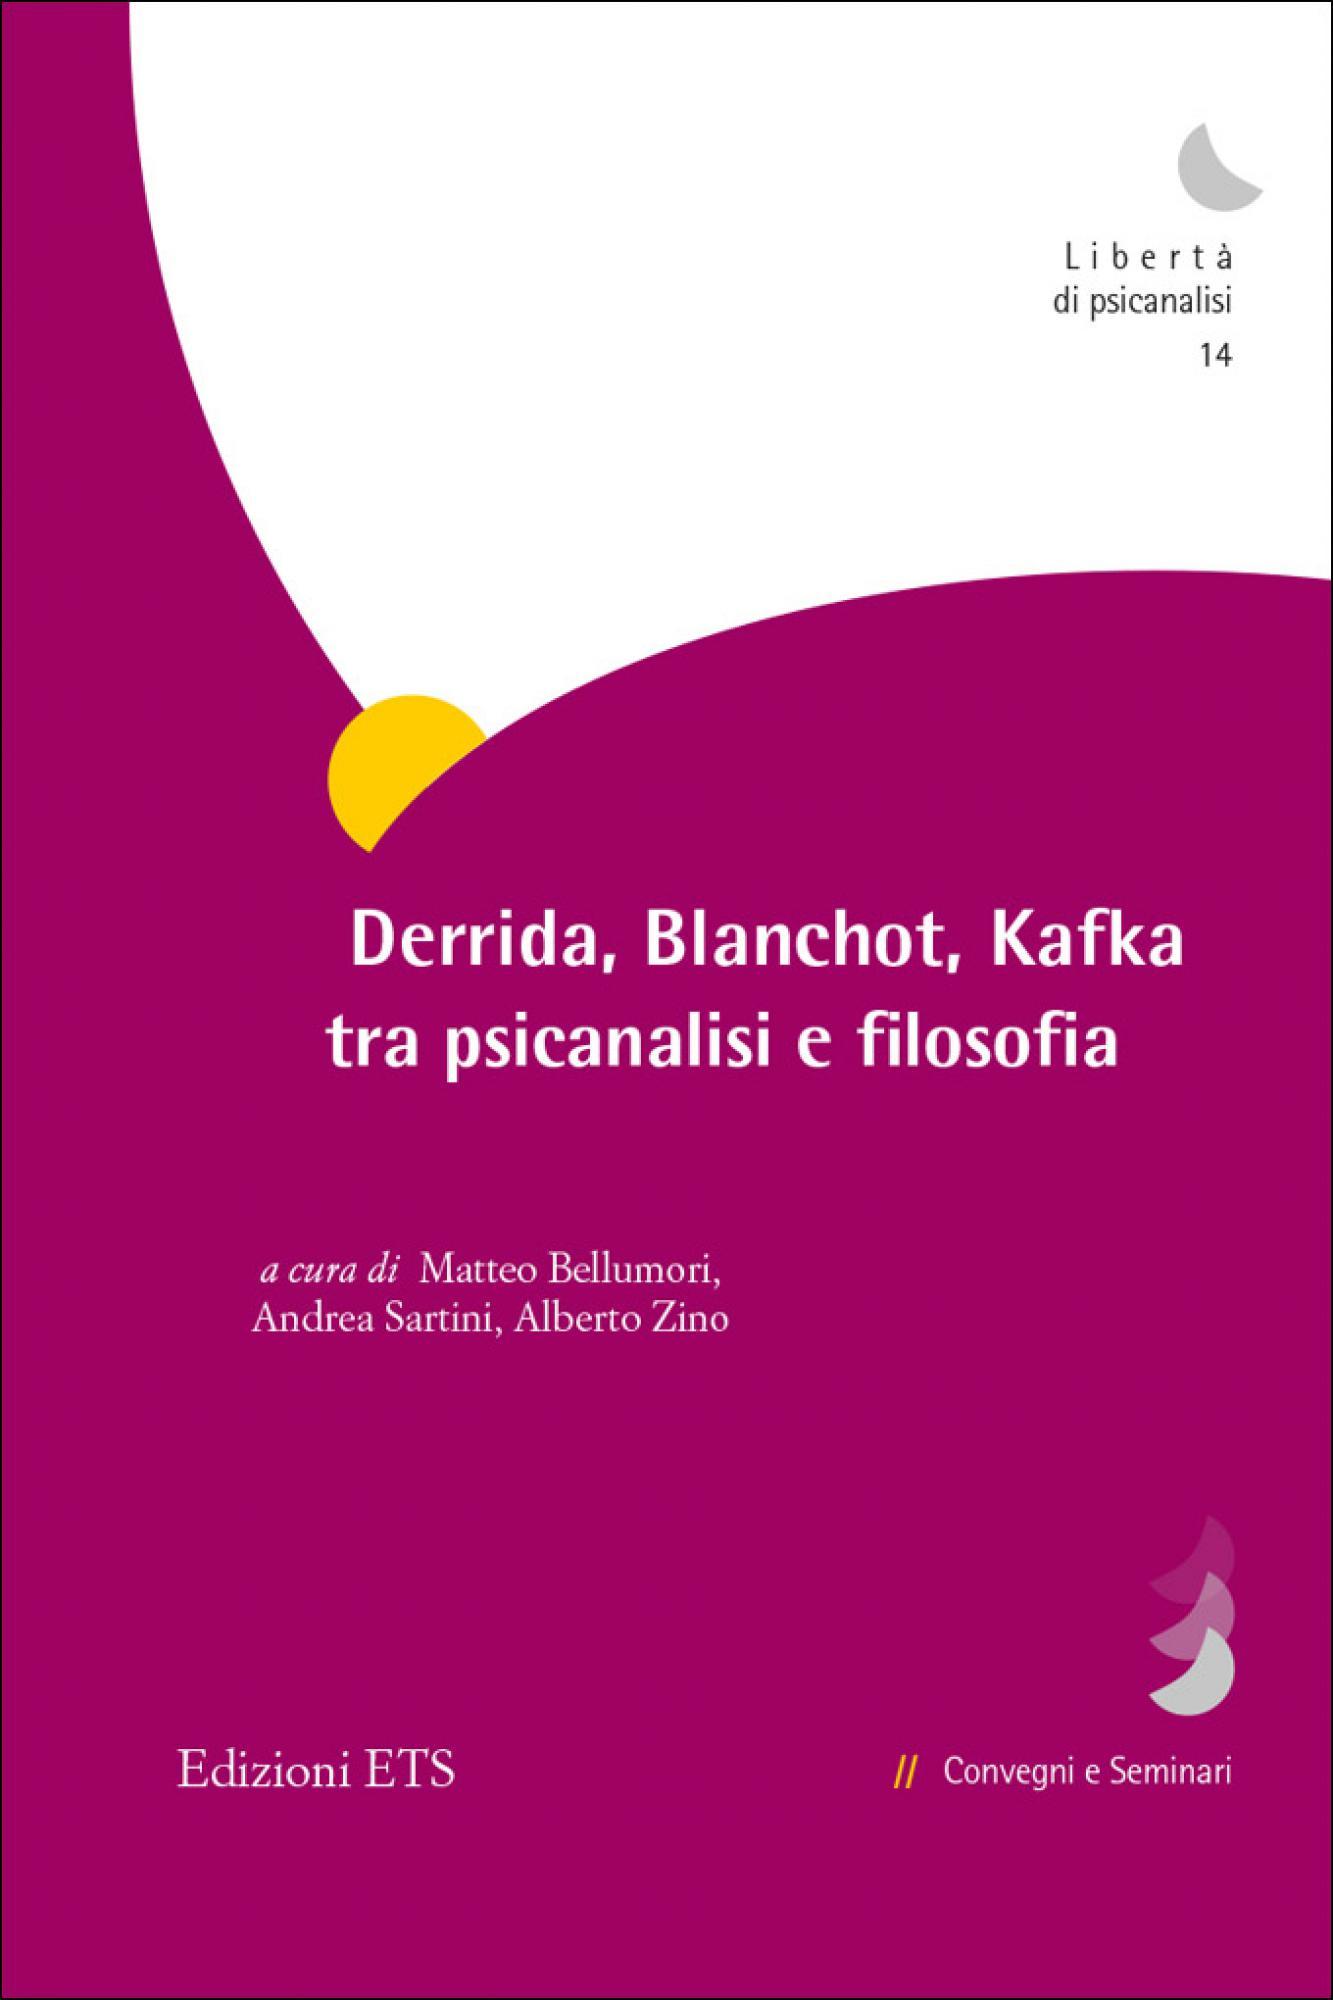 Derrida, Blanchot, Kafka tra psicanalisi e filosofia